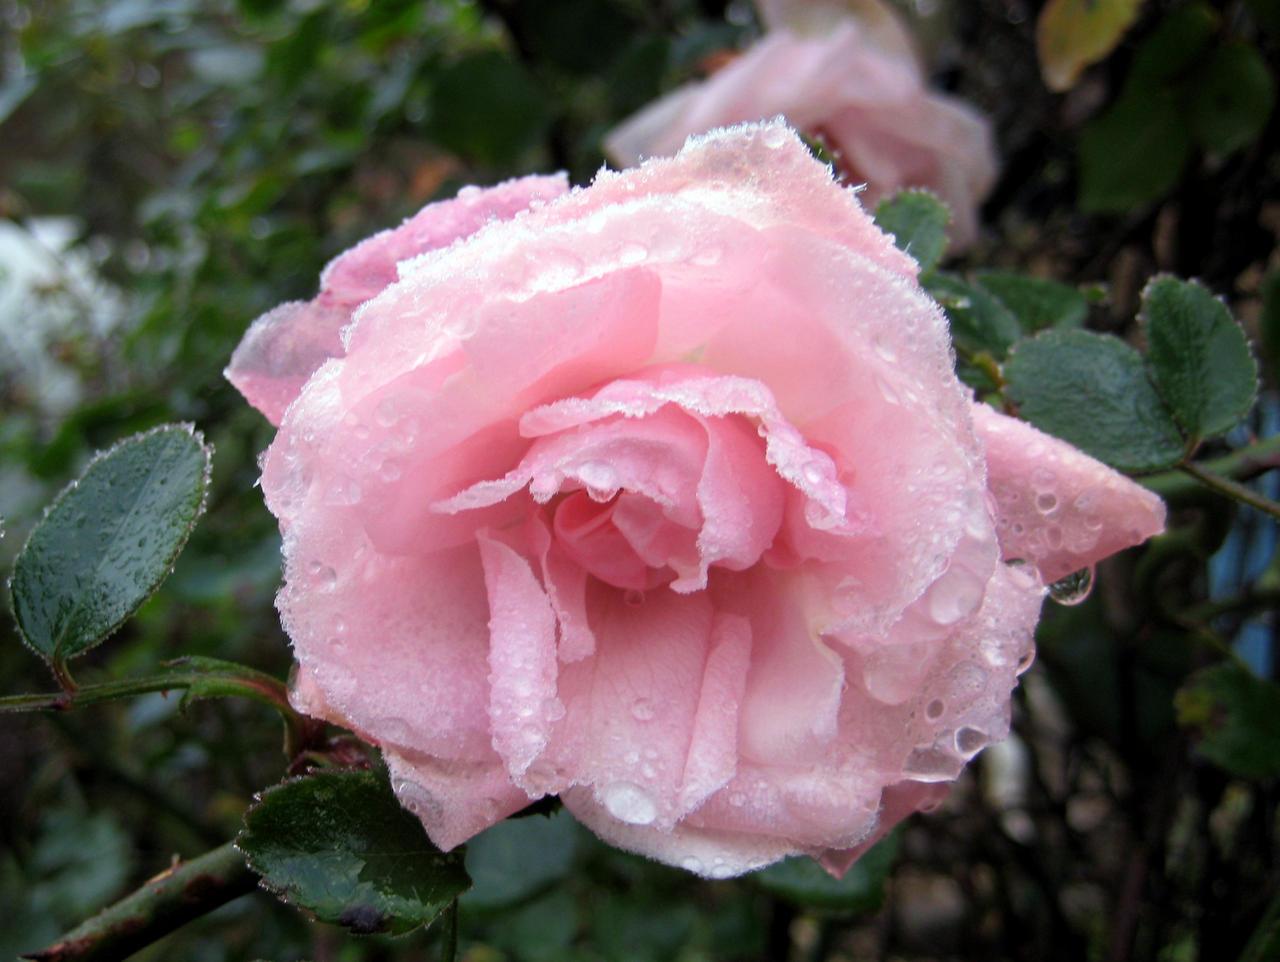 Frozen Rose by Akamasdiver